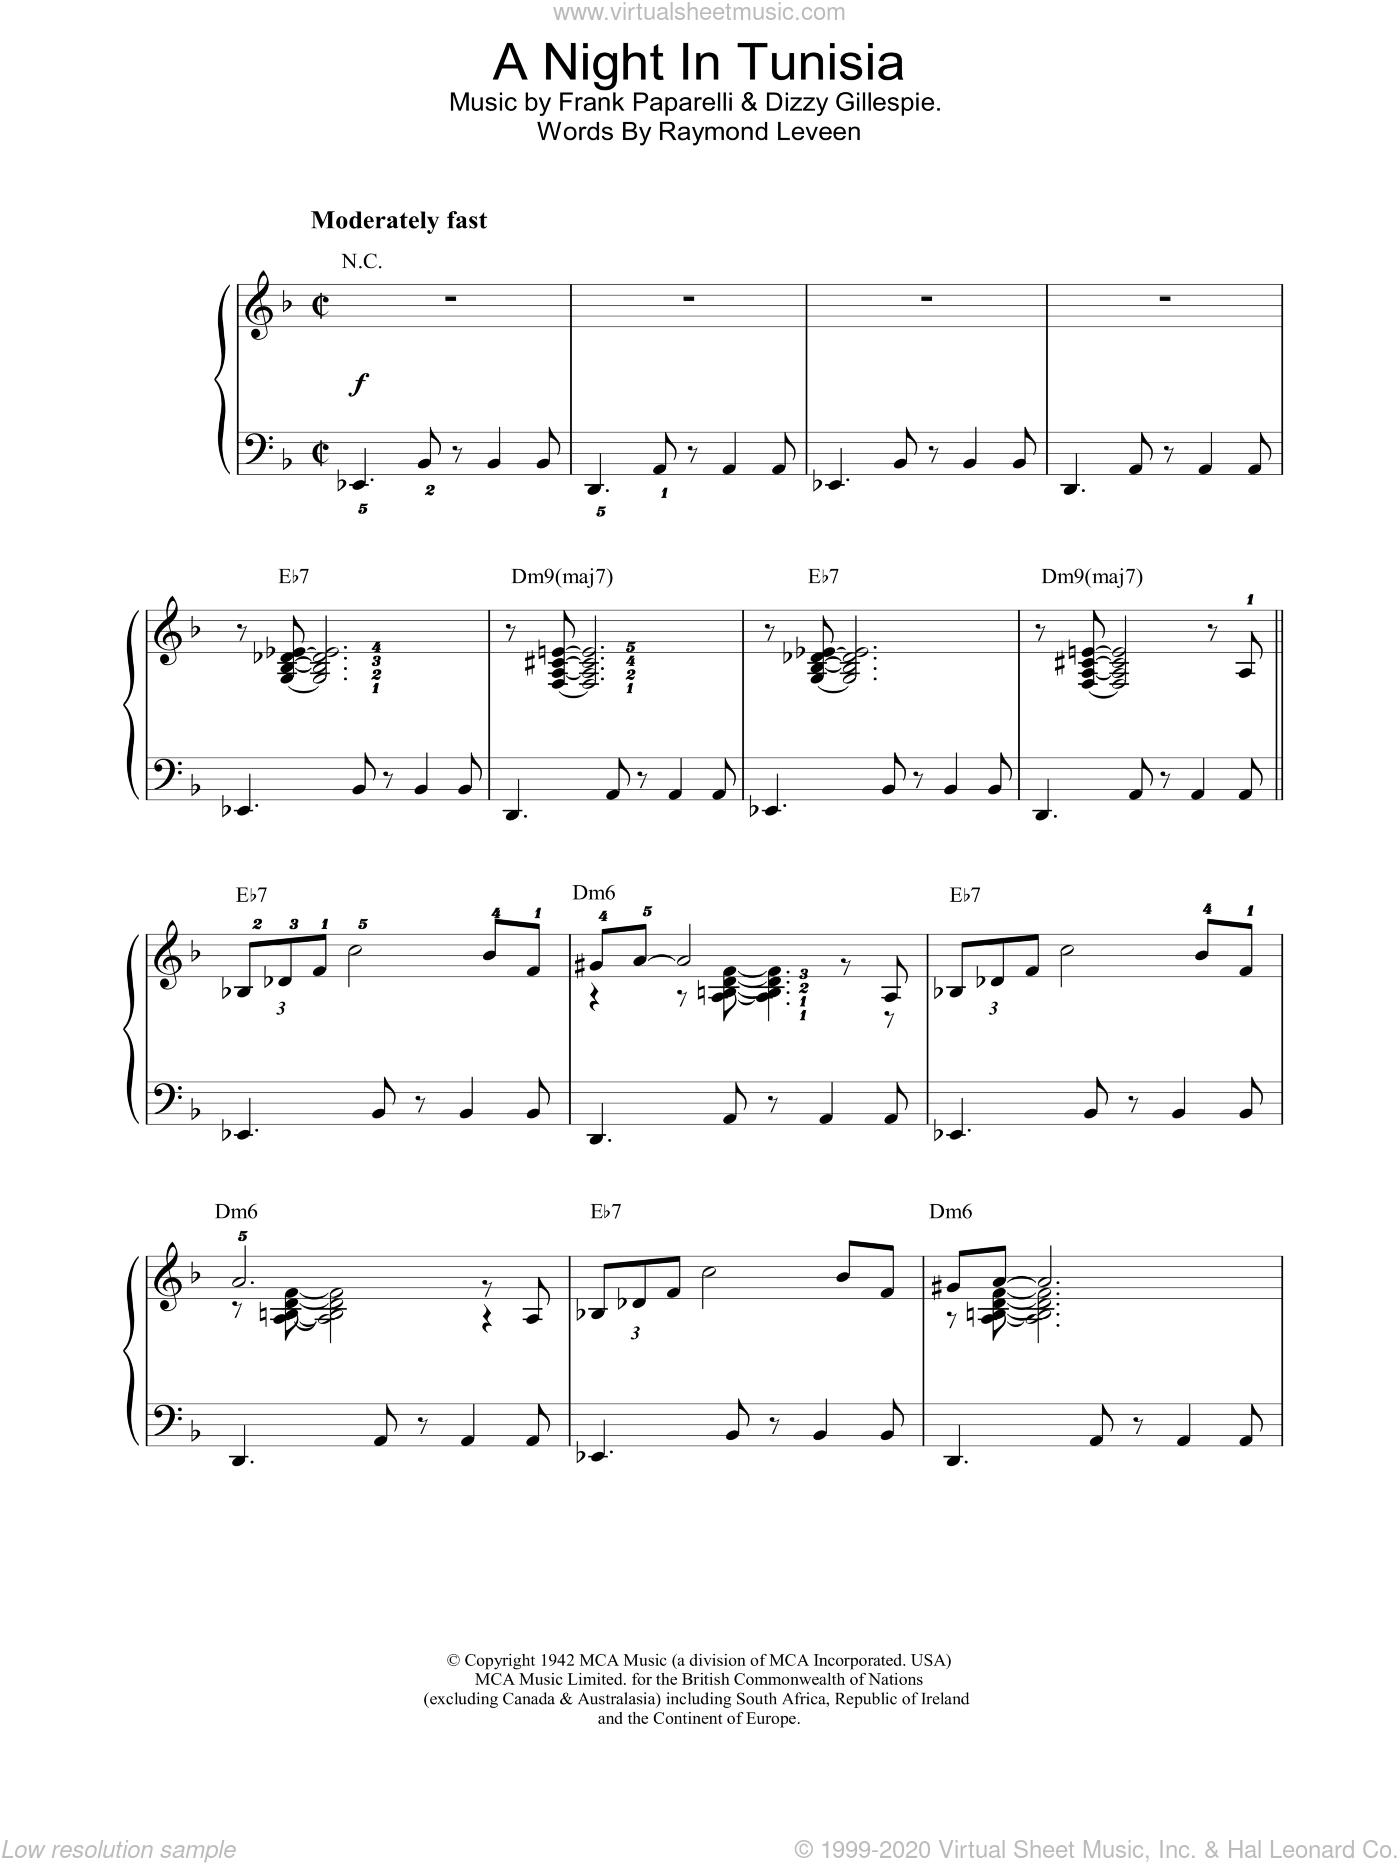 A Night In Tunisia sheet music for piano solo by Dizzy Gillespie and Frank Paparelli, intermediate skill level